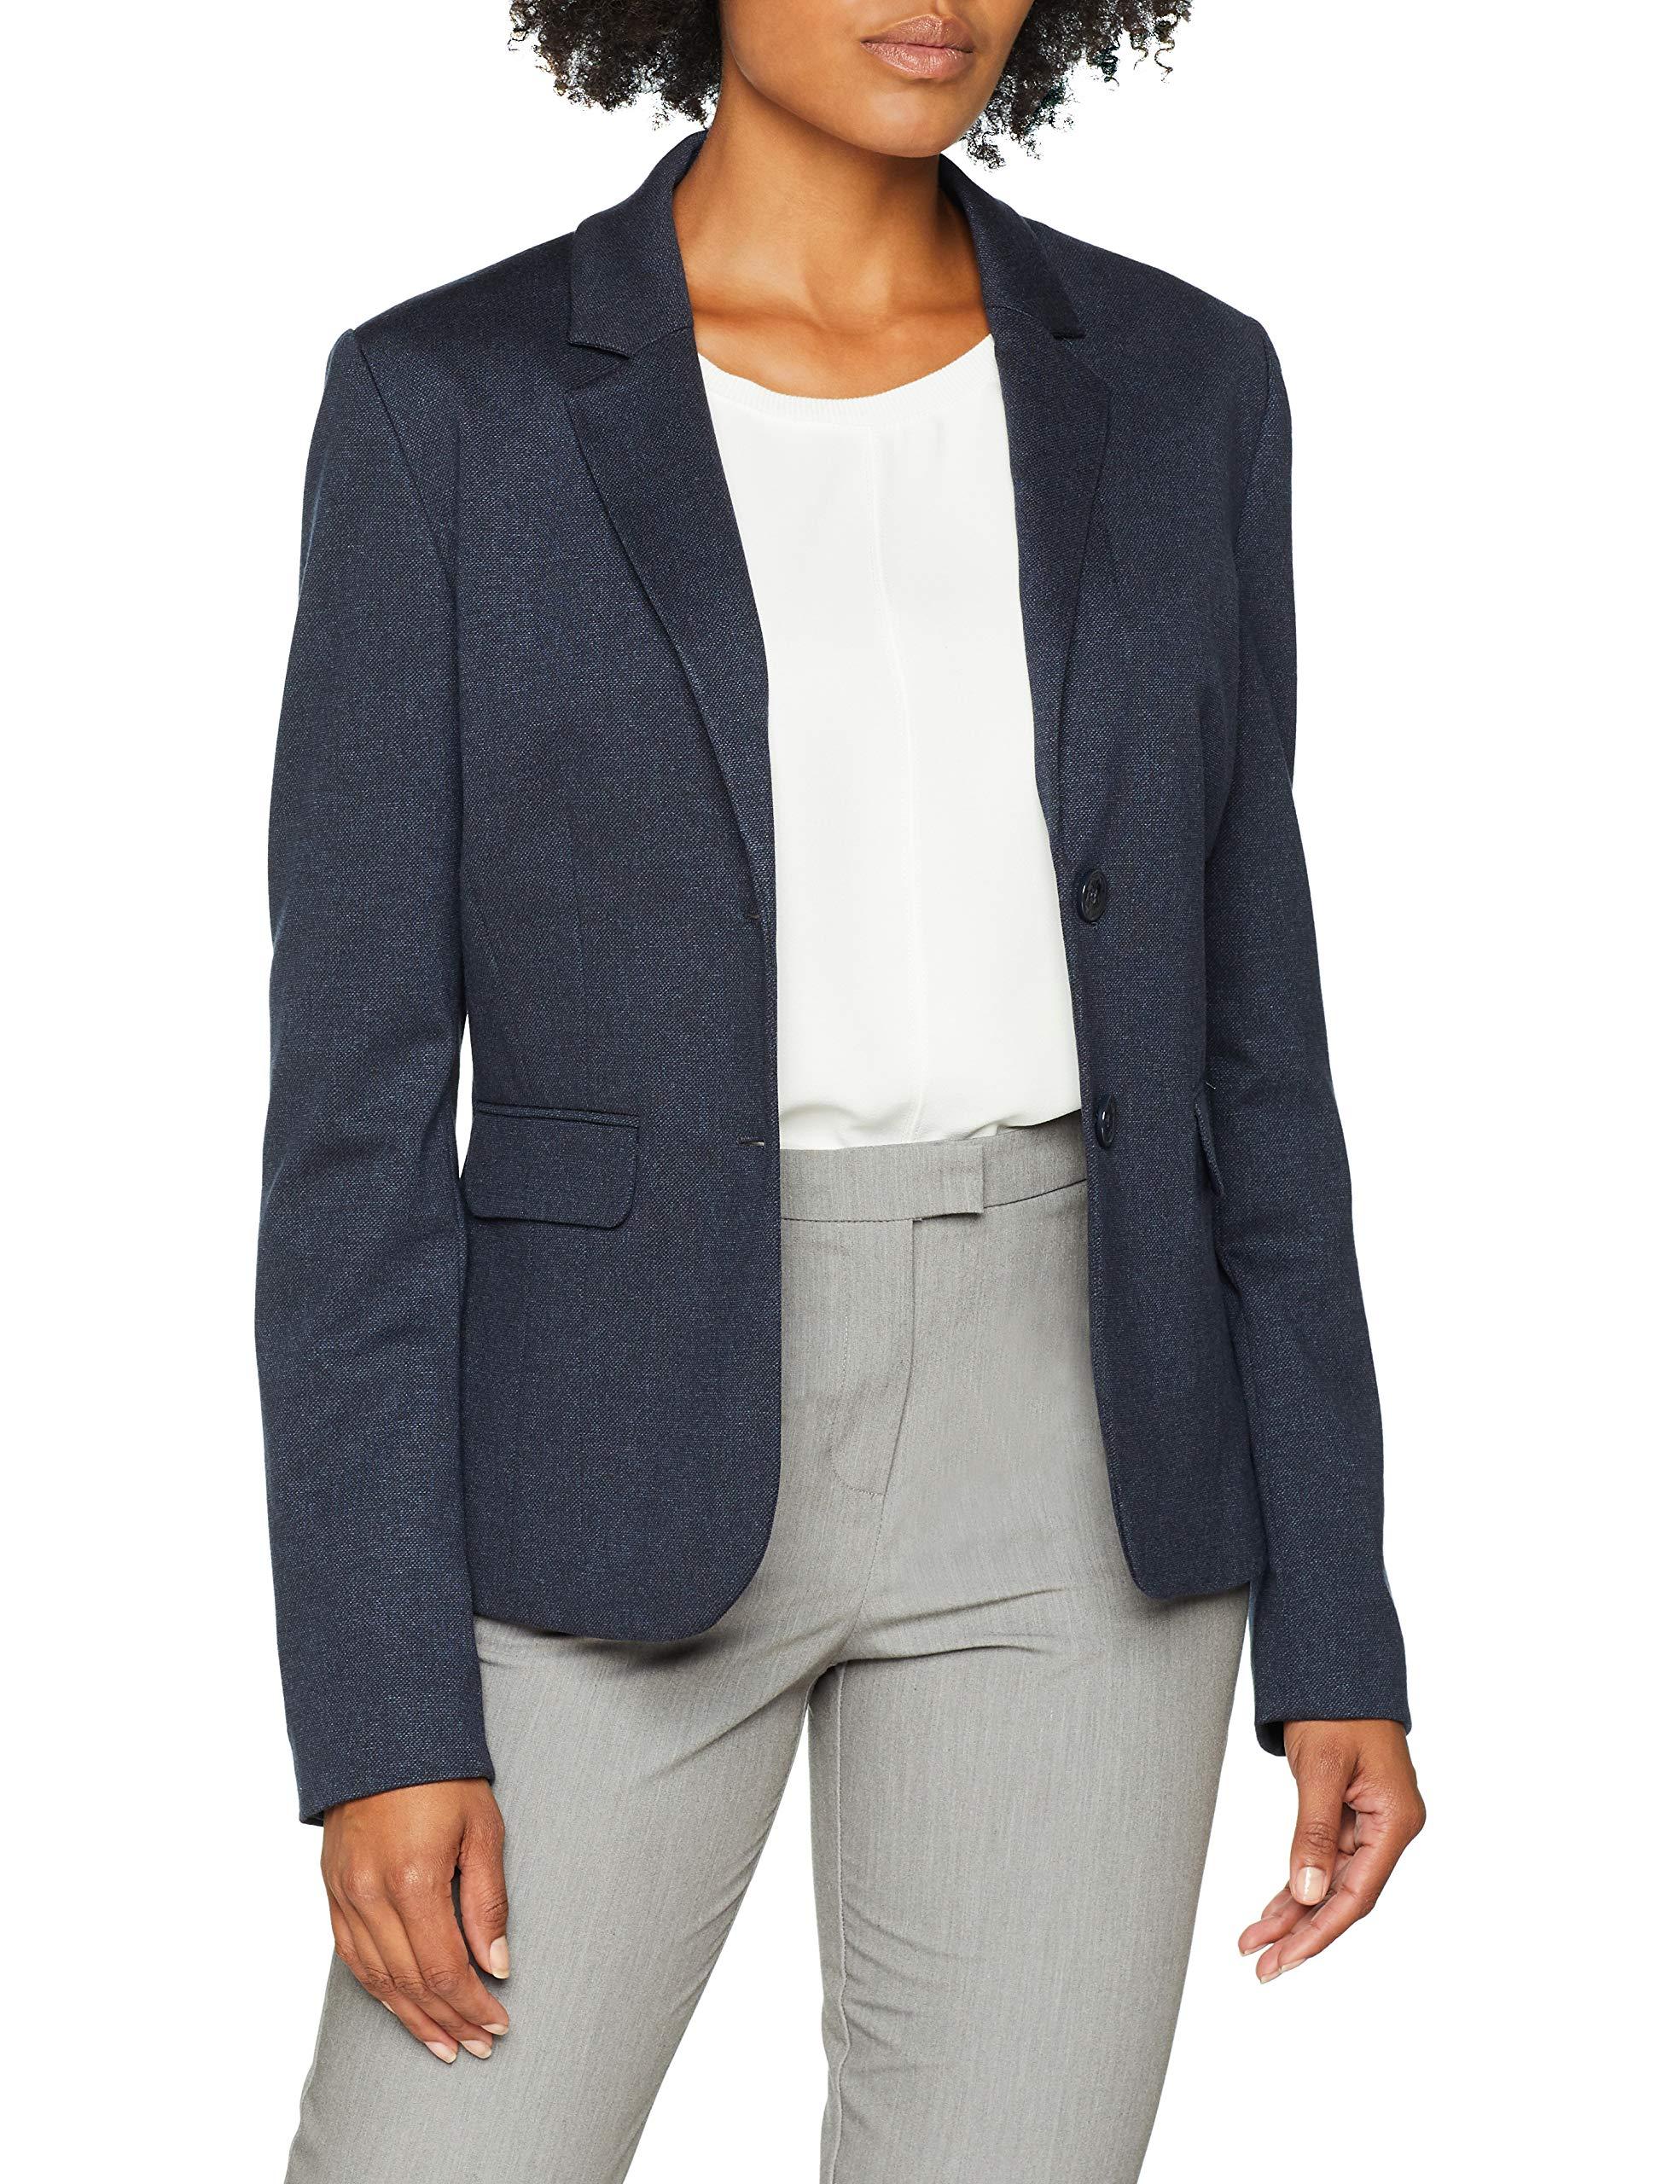 Blazer Color Veste De 2 Femme CostumeMehrfarbigmarine 237544 Moreamp; ywPm80vNnO